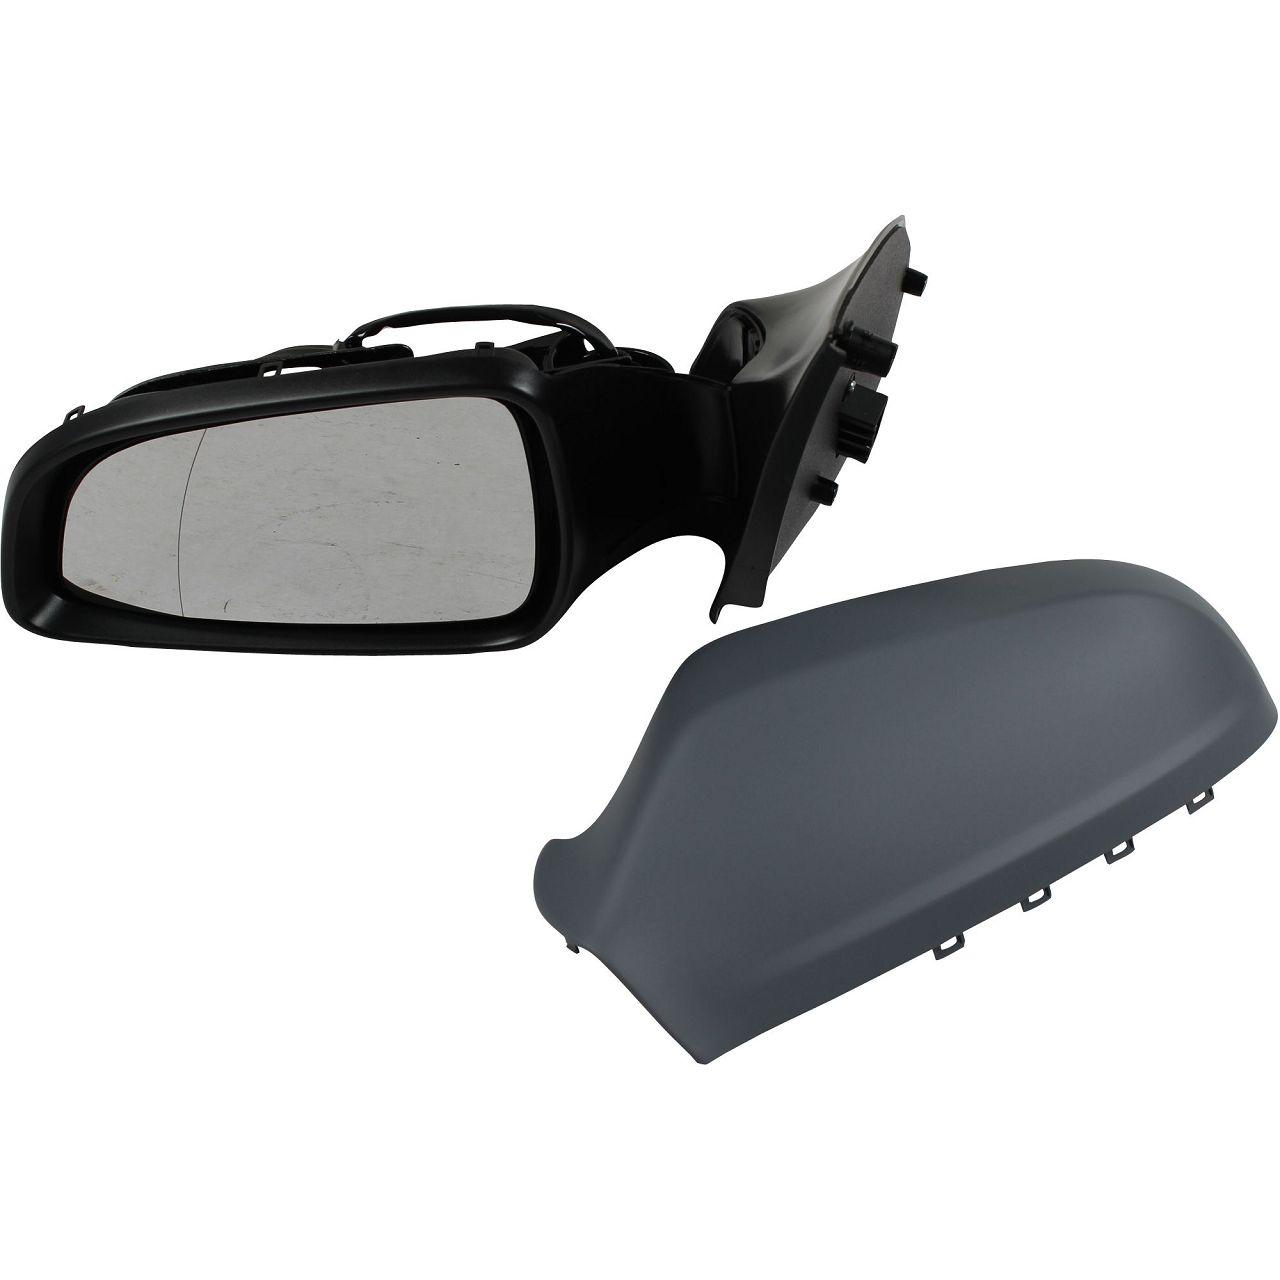 Außenspiegel KOMPLETT elektrisch beheizbar OPEL Astra H 5-türig LINKS